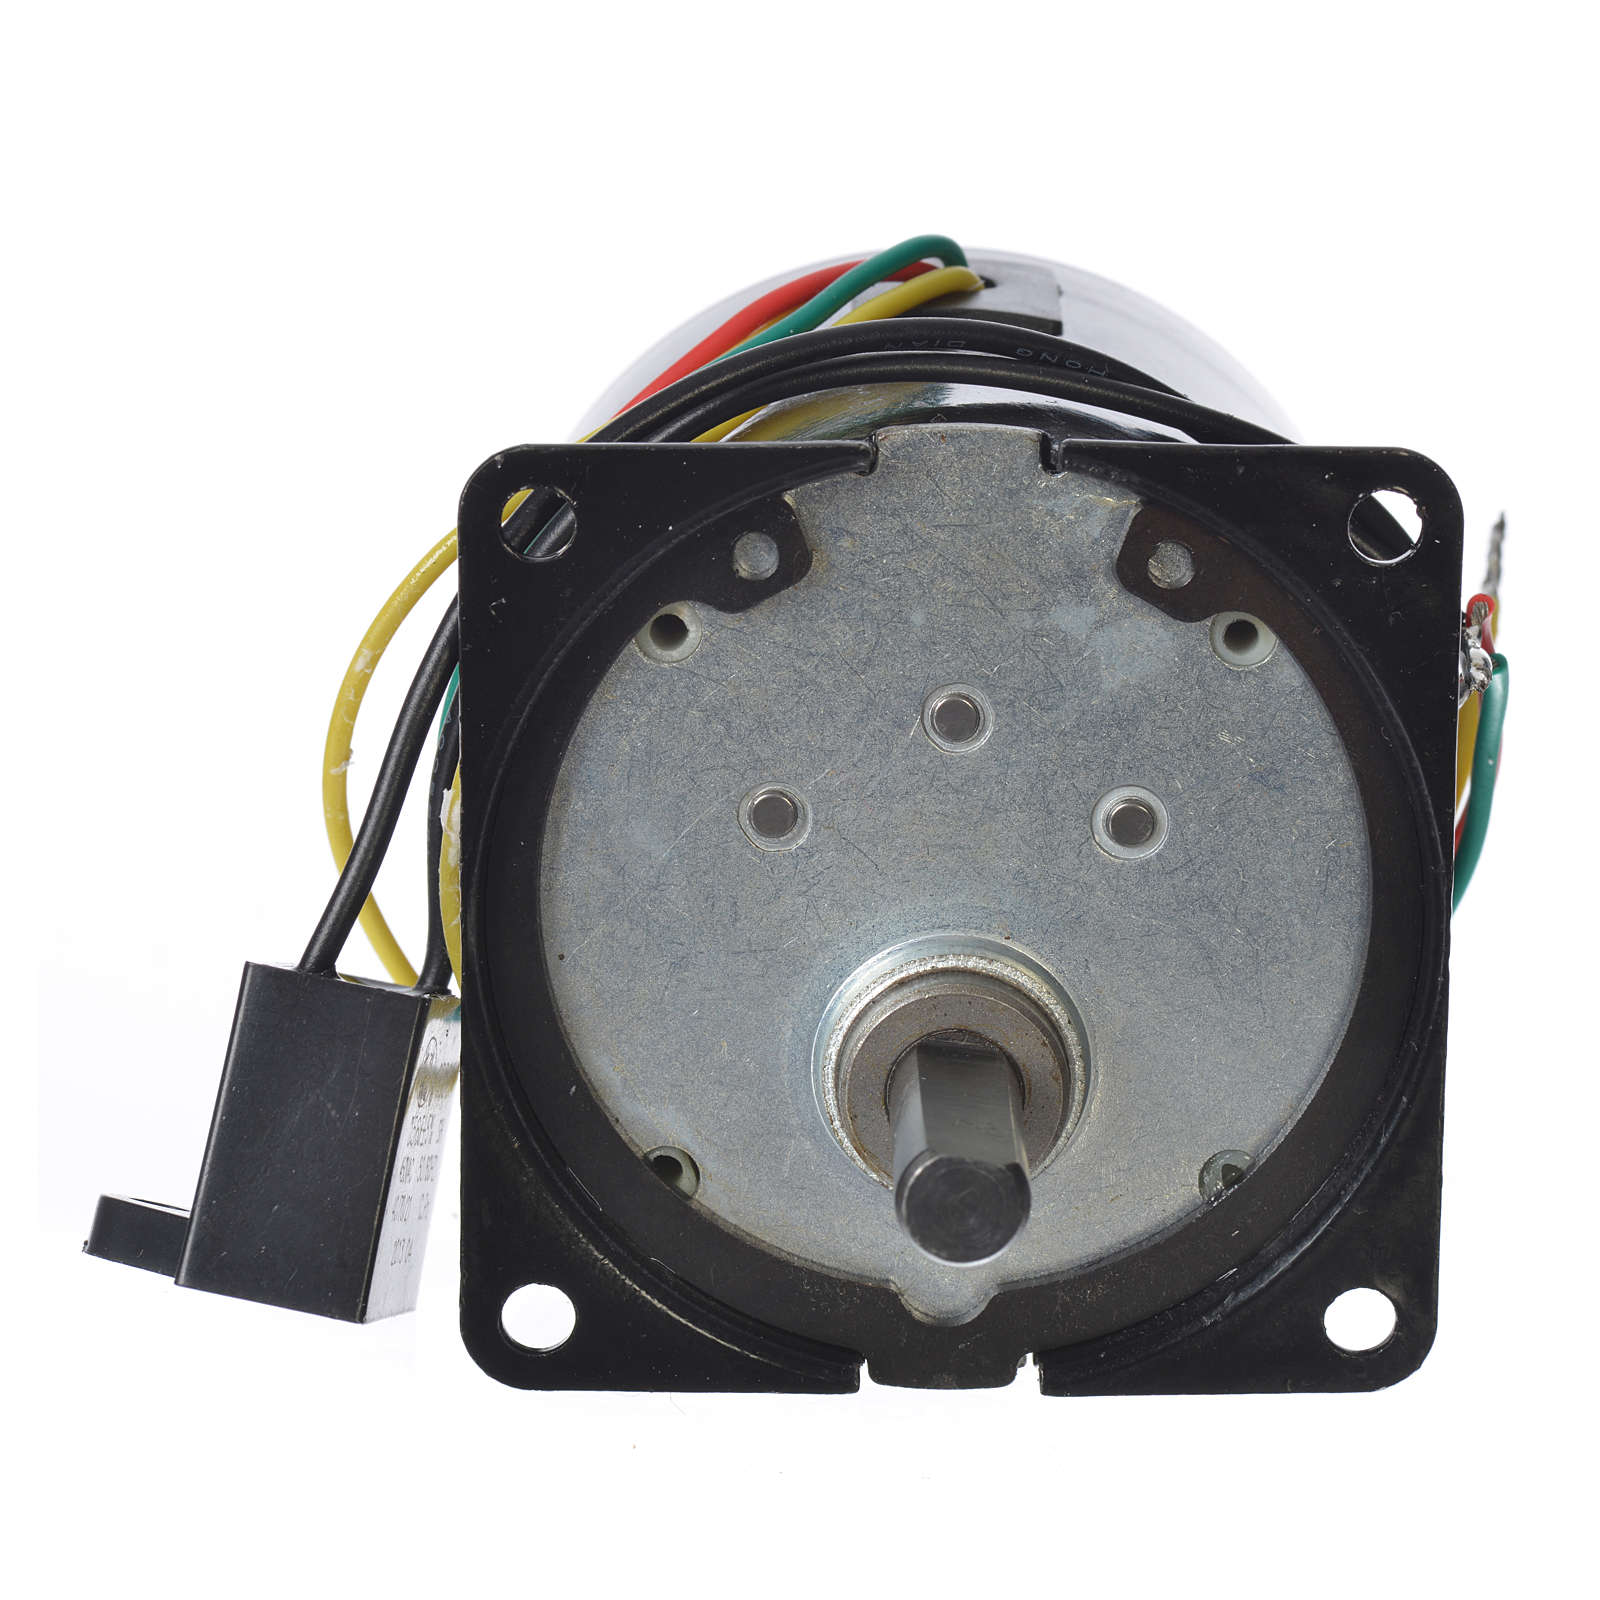 Getriebemotor MPW 2,5 Drehungen/Min für Krippe 4